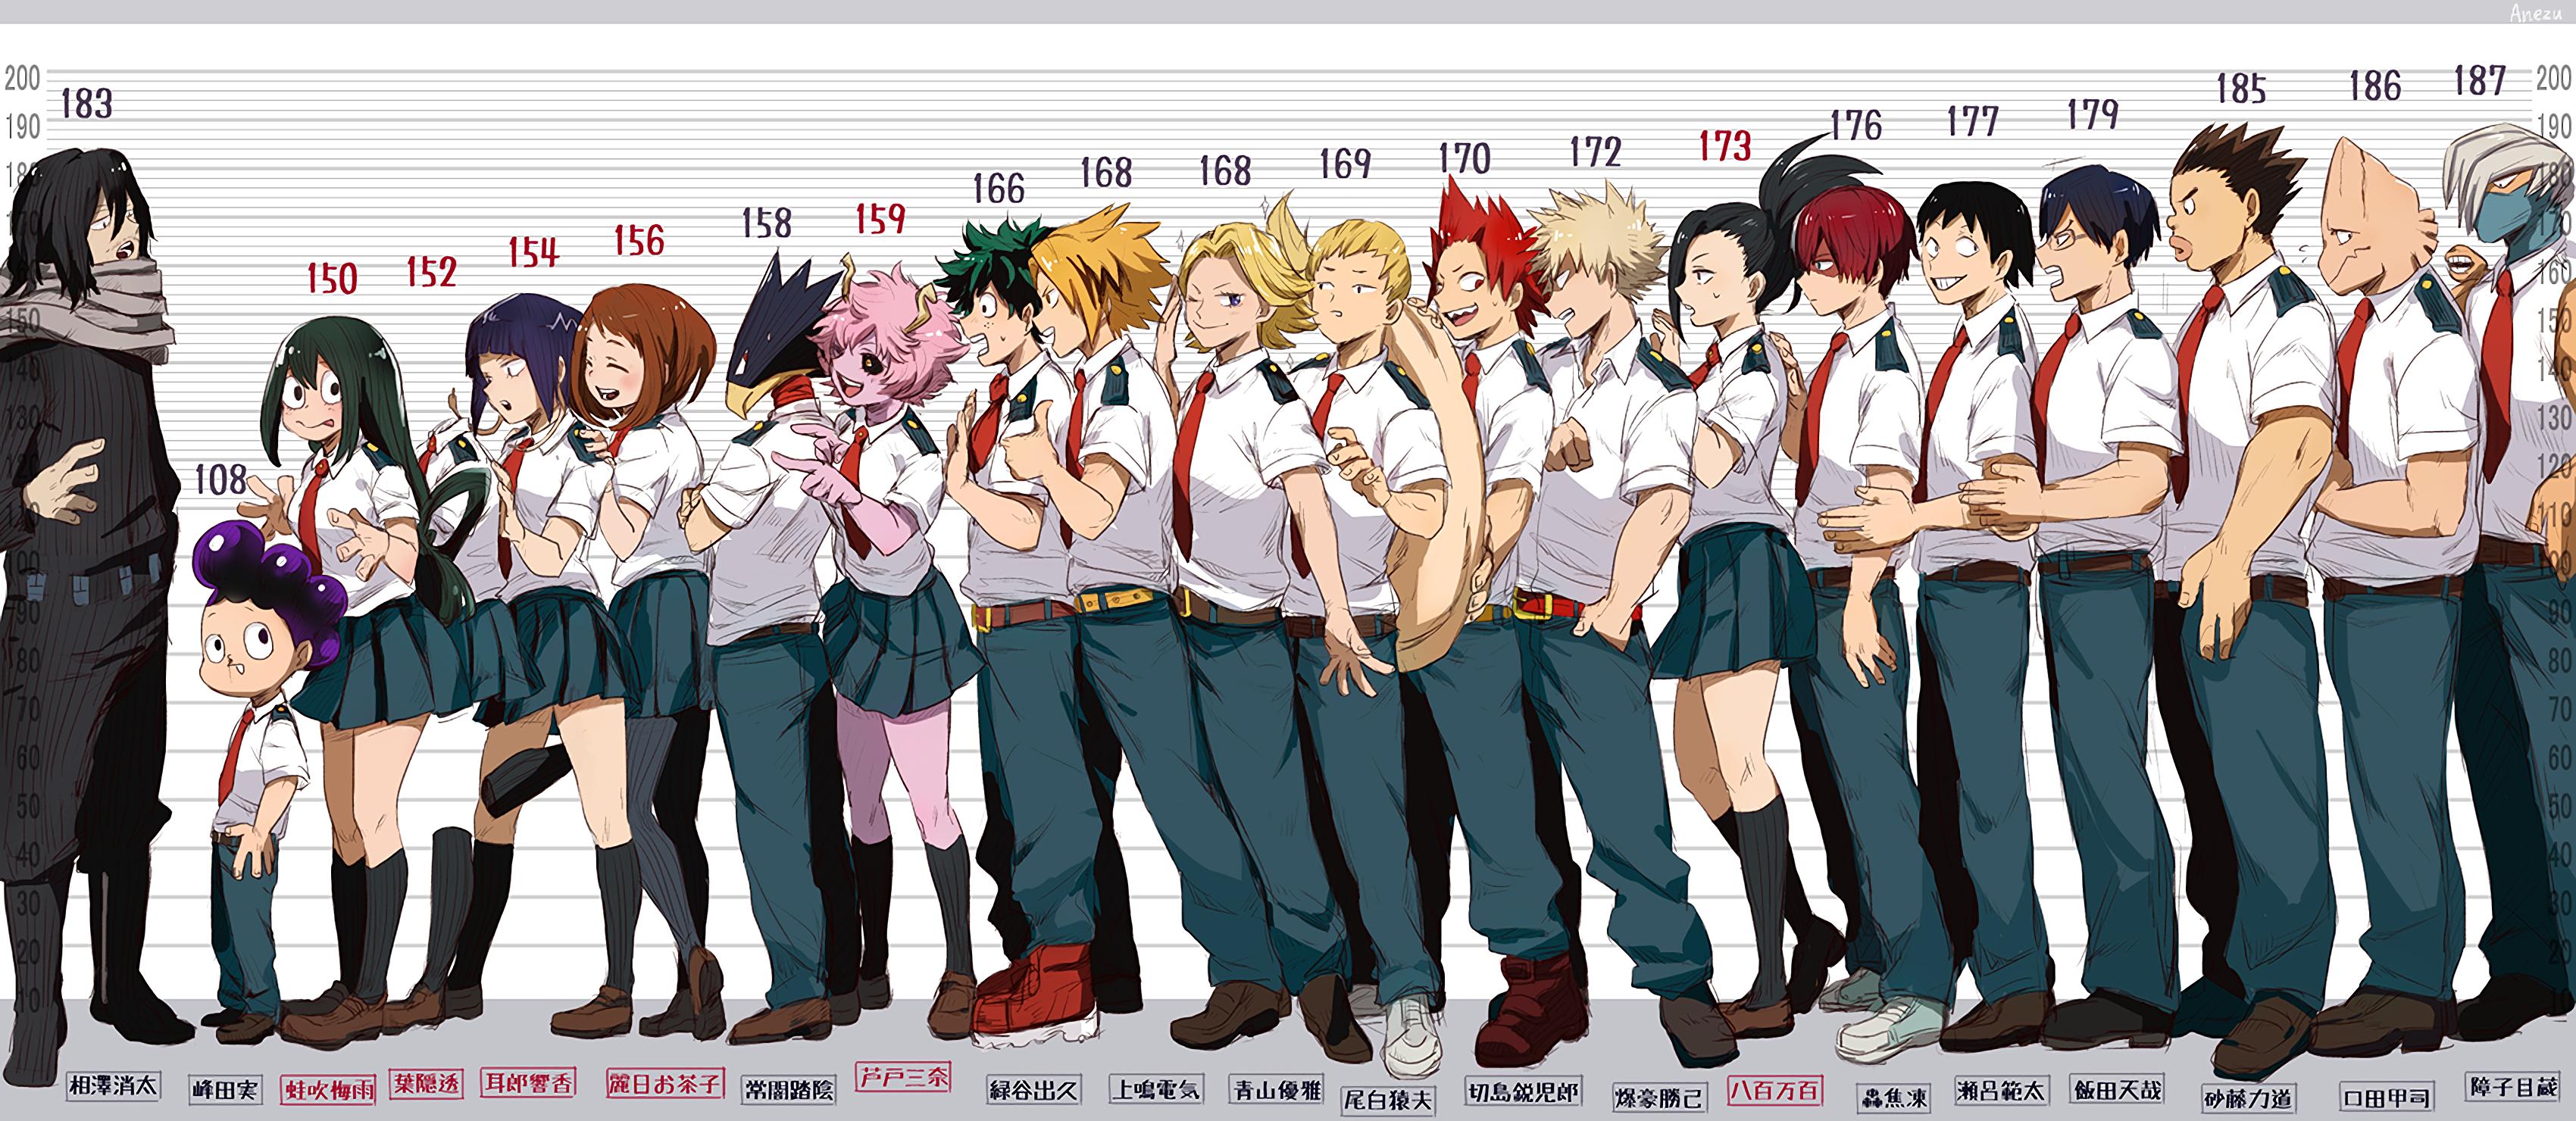 218 Katsuki Bakugou Hd Wallpapers  Backgrounds - Wallpaper Abyss - Page 2-3814